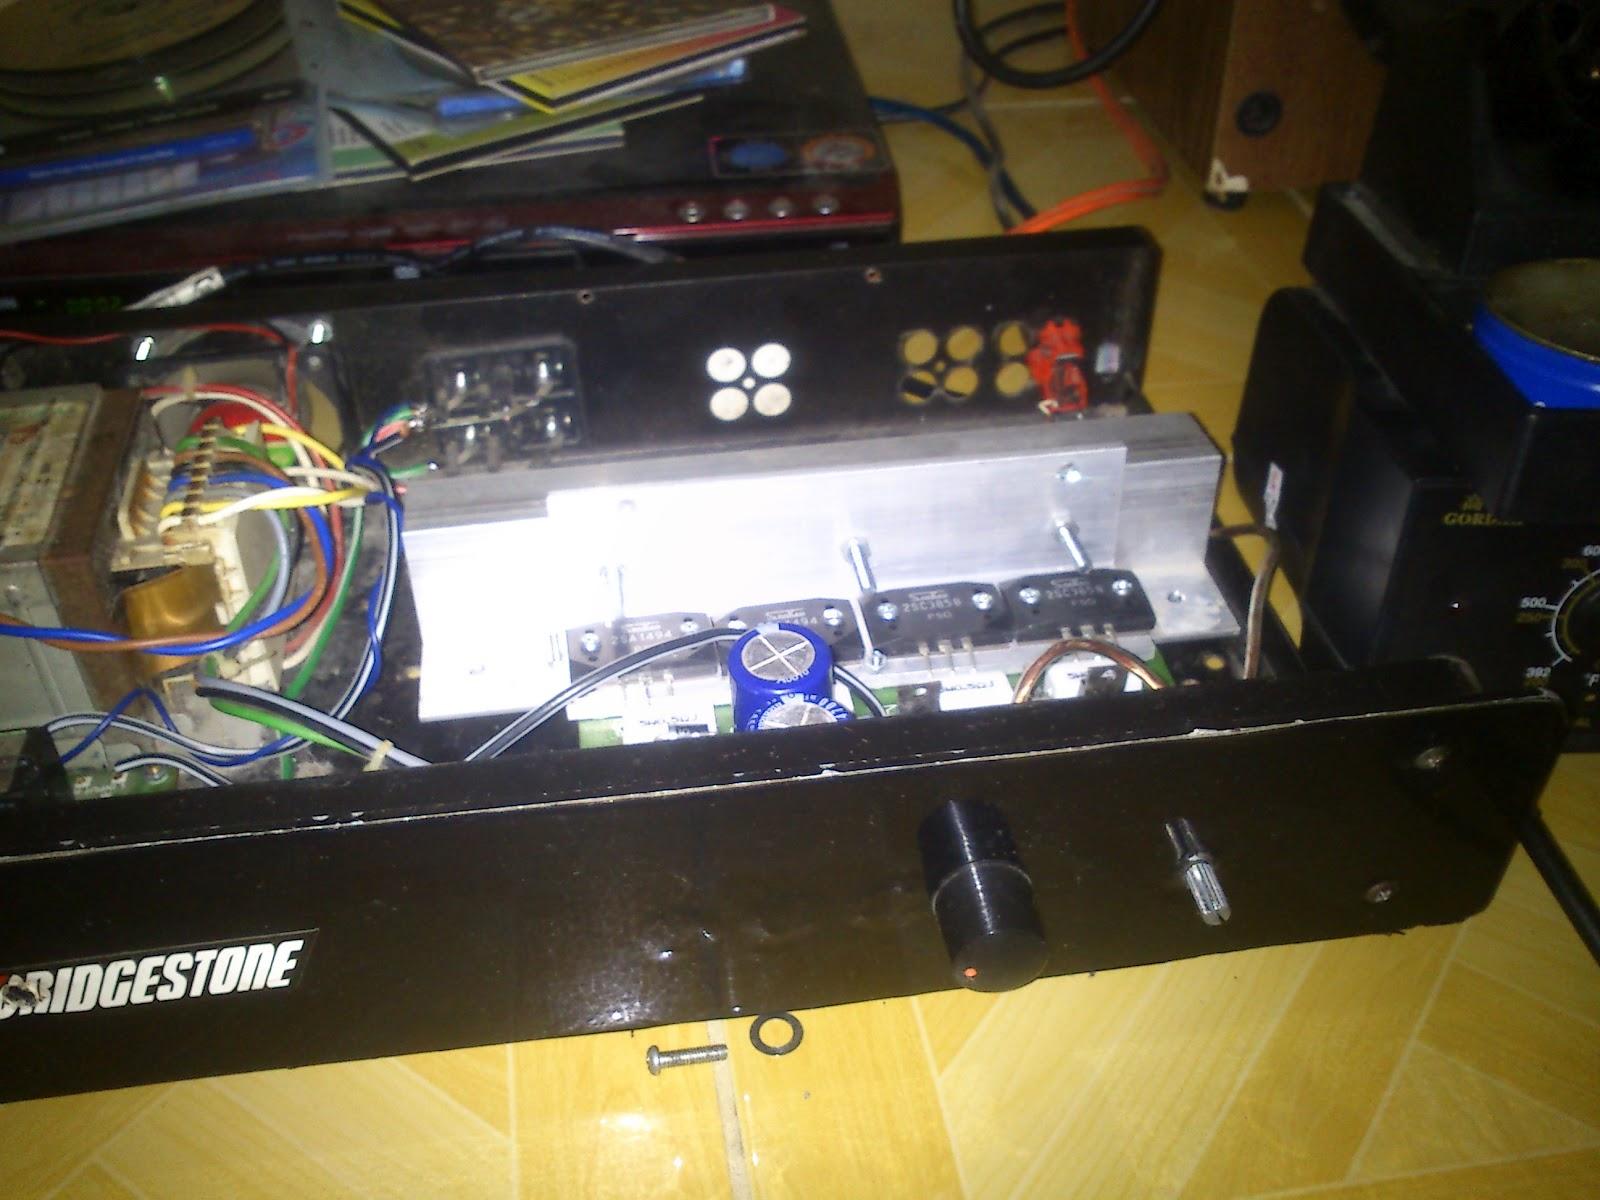 Iqbal Blogs Merakit Subwoofer Amplifier Murah Lm324 Op Amp Http Wwwpic2flycom Lm324opamphtml